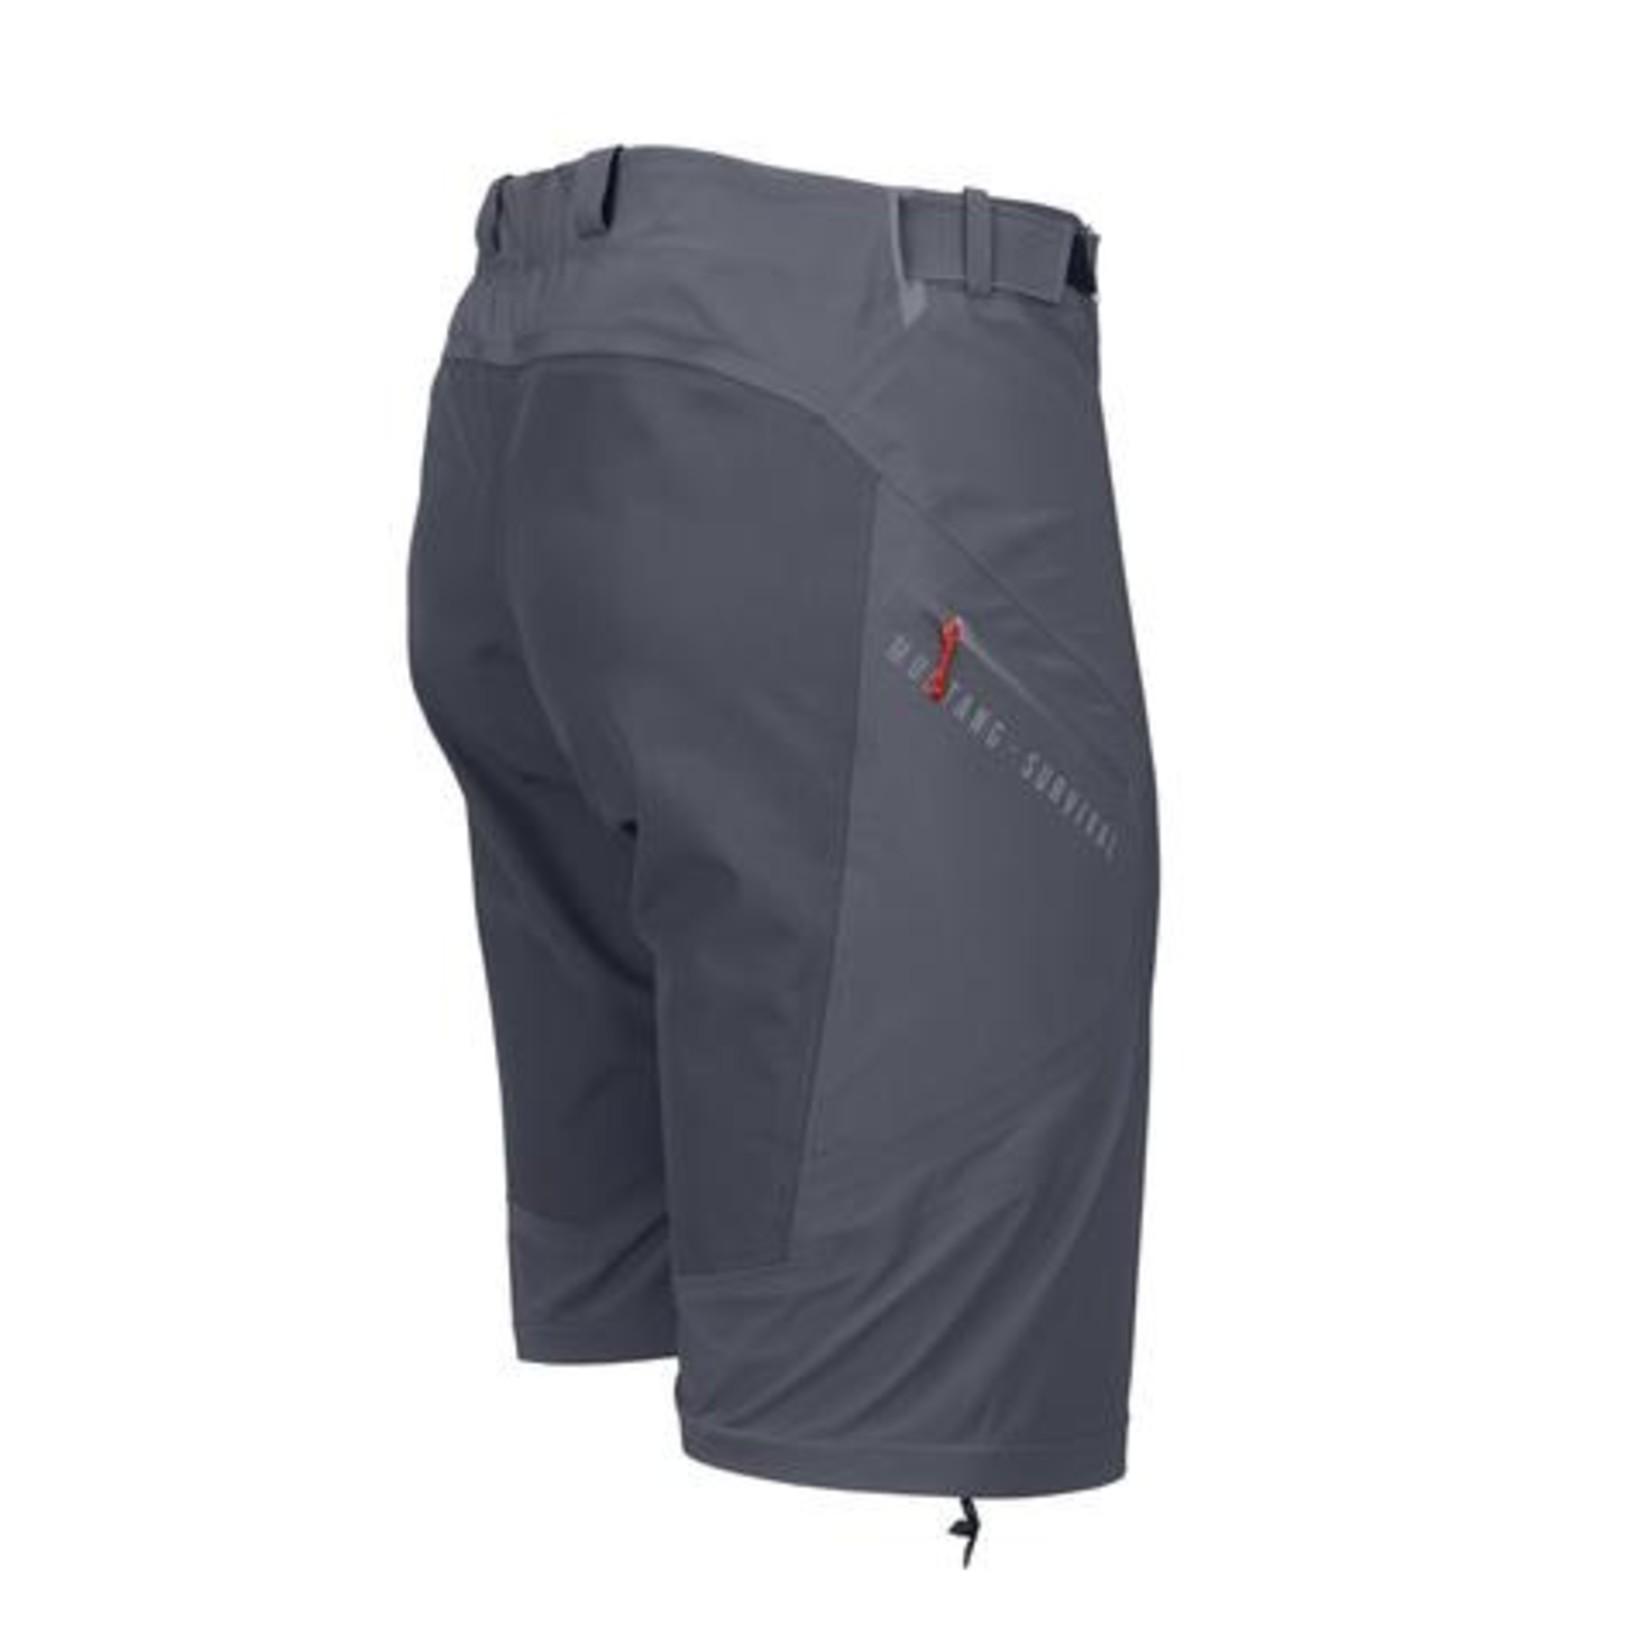 Mustang Survival Mustang Survival Callan™ Waterproof Shorts - Updated